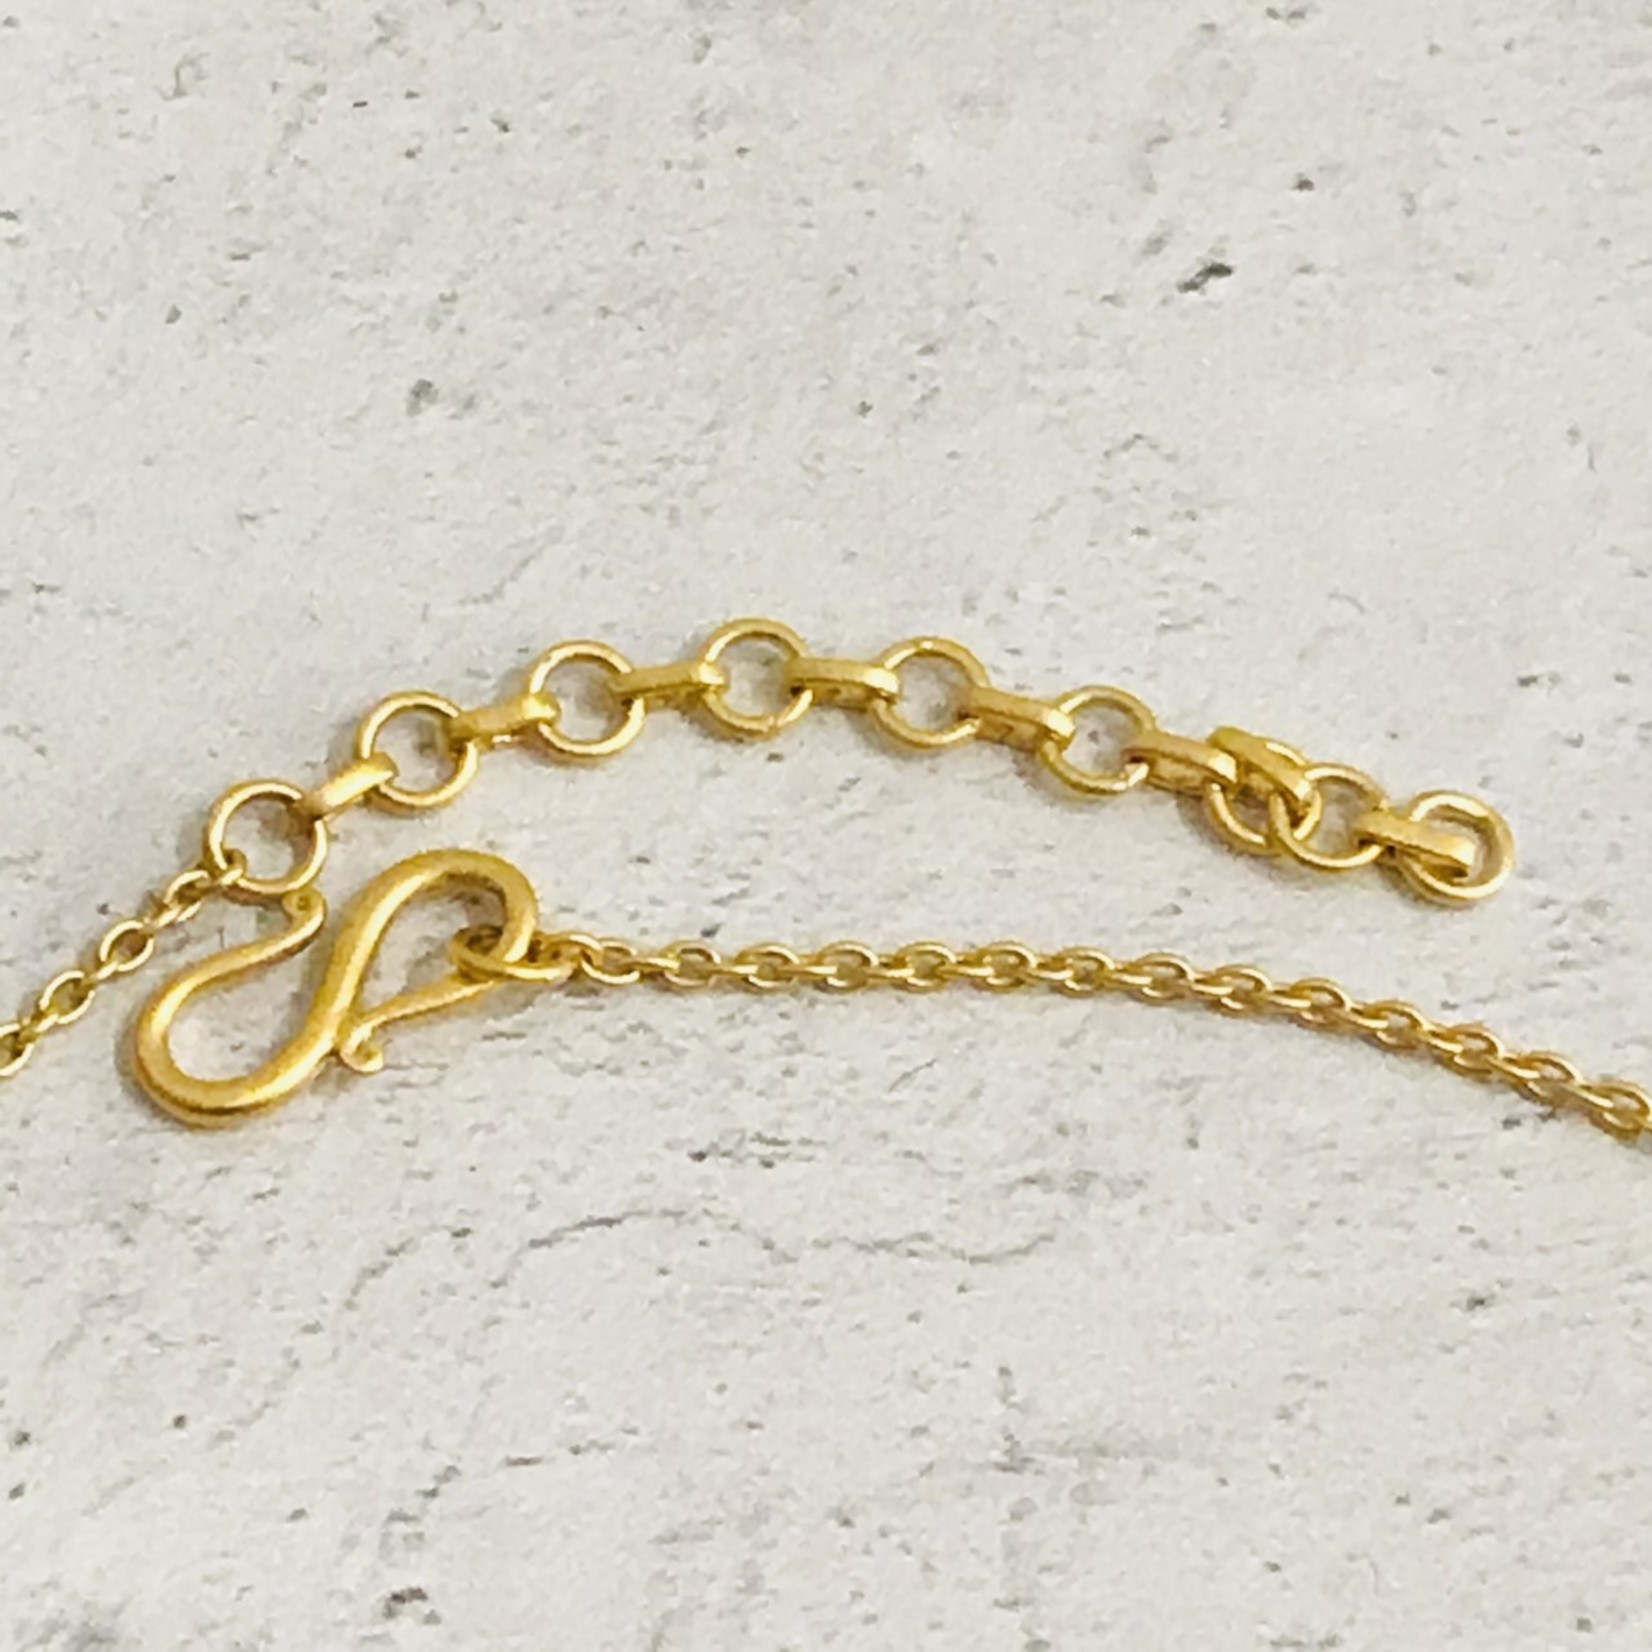 Himatsingka Jewelry Himatsingka Jewelry Calderi 2- Layer Necklace